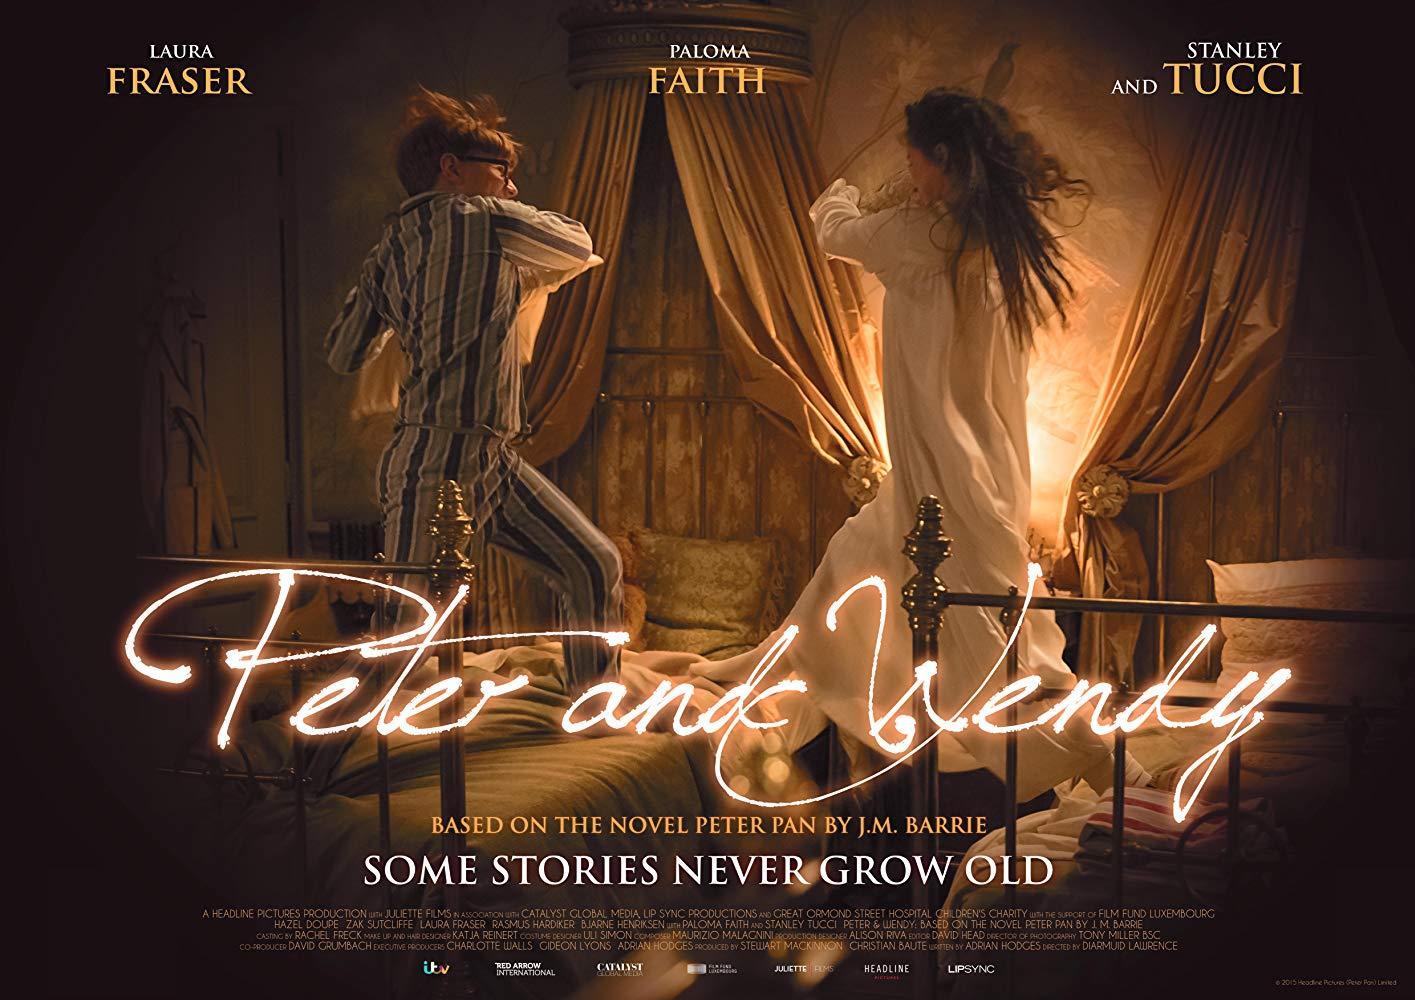 مشاهدة فيلم Peter And Wendy 2015 HD مترجم كامل اون لاين